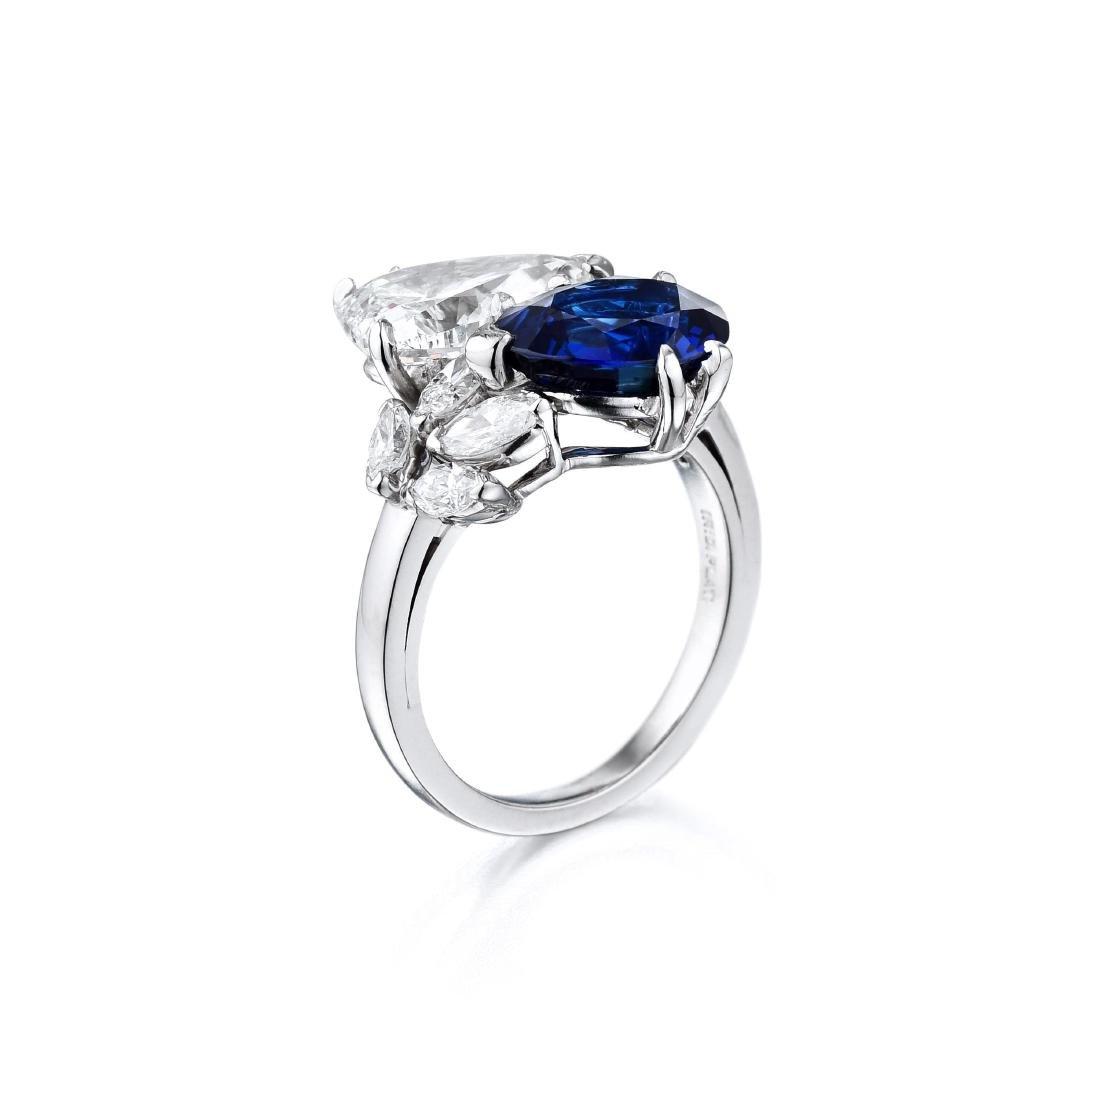 A Platinum Sapphire and Diamond Ring - 2